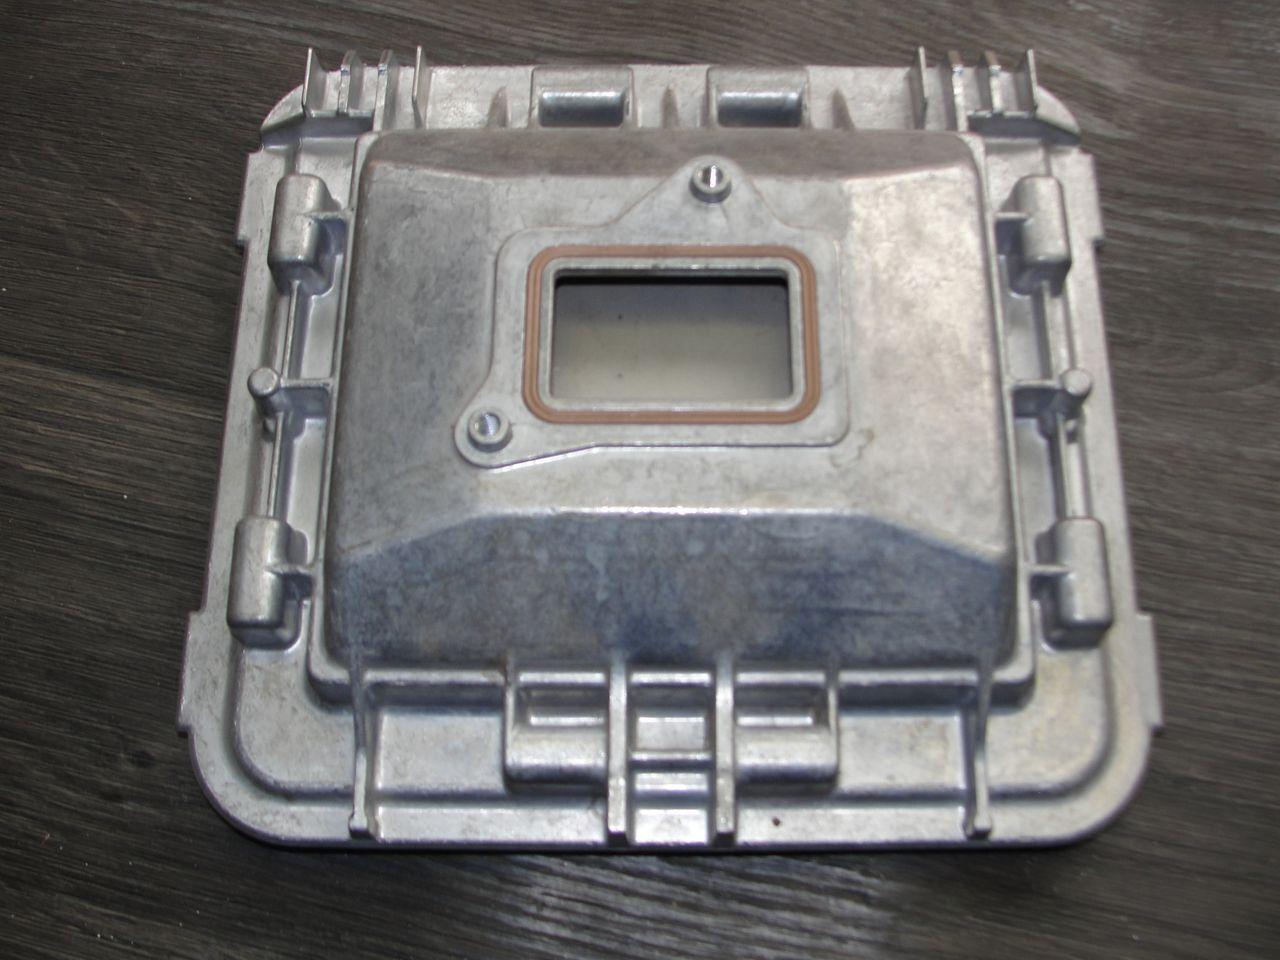 Vaillant Vaillant Vaillant VCW 206 EU HL Brenner Brennerplatte (516) 1cc127